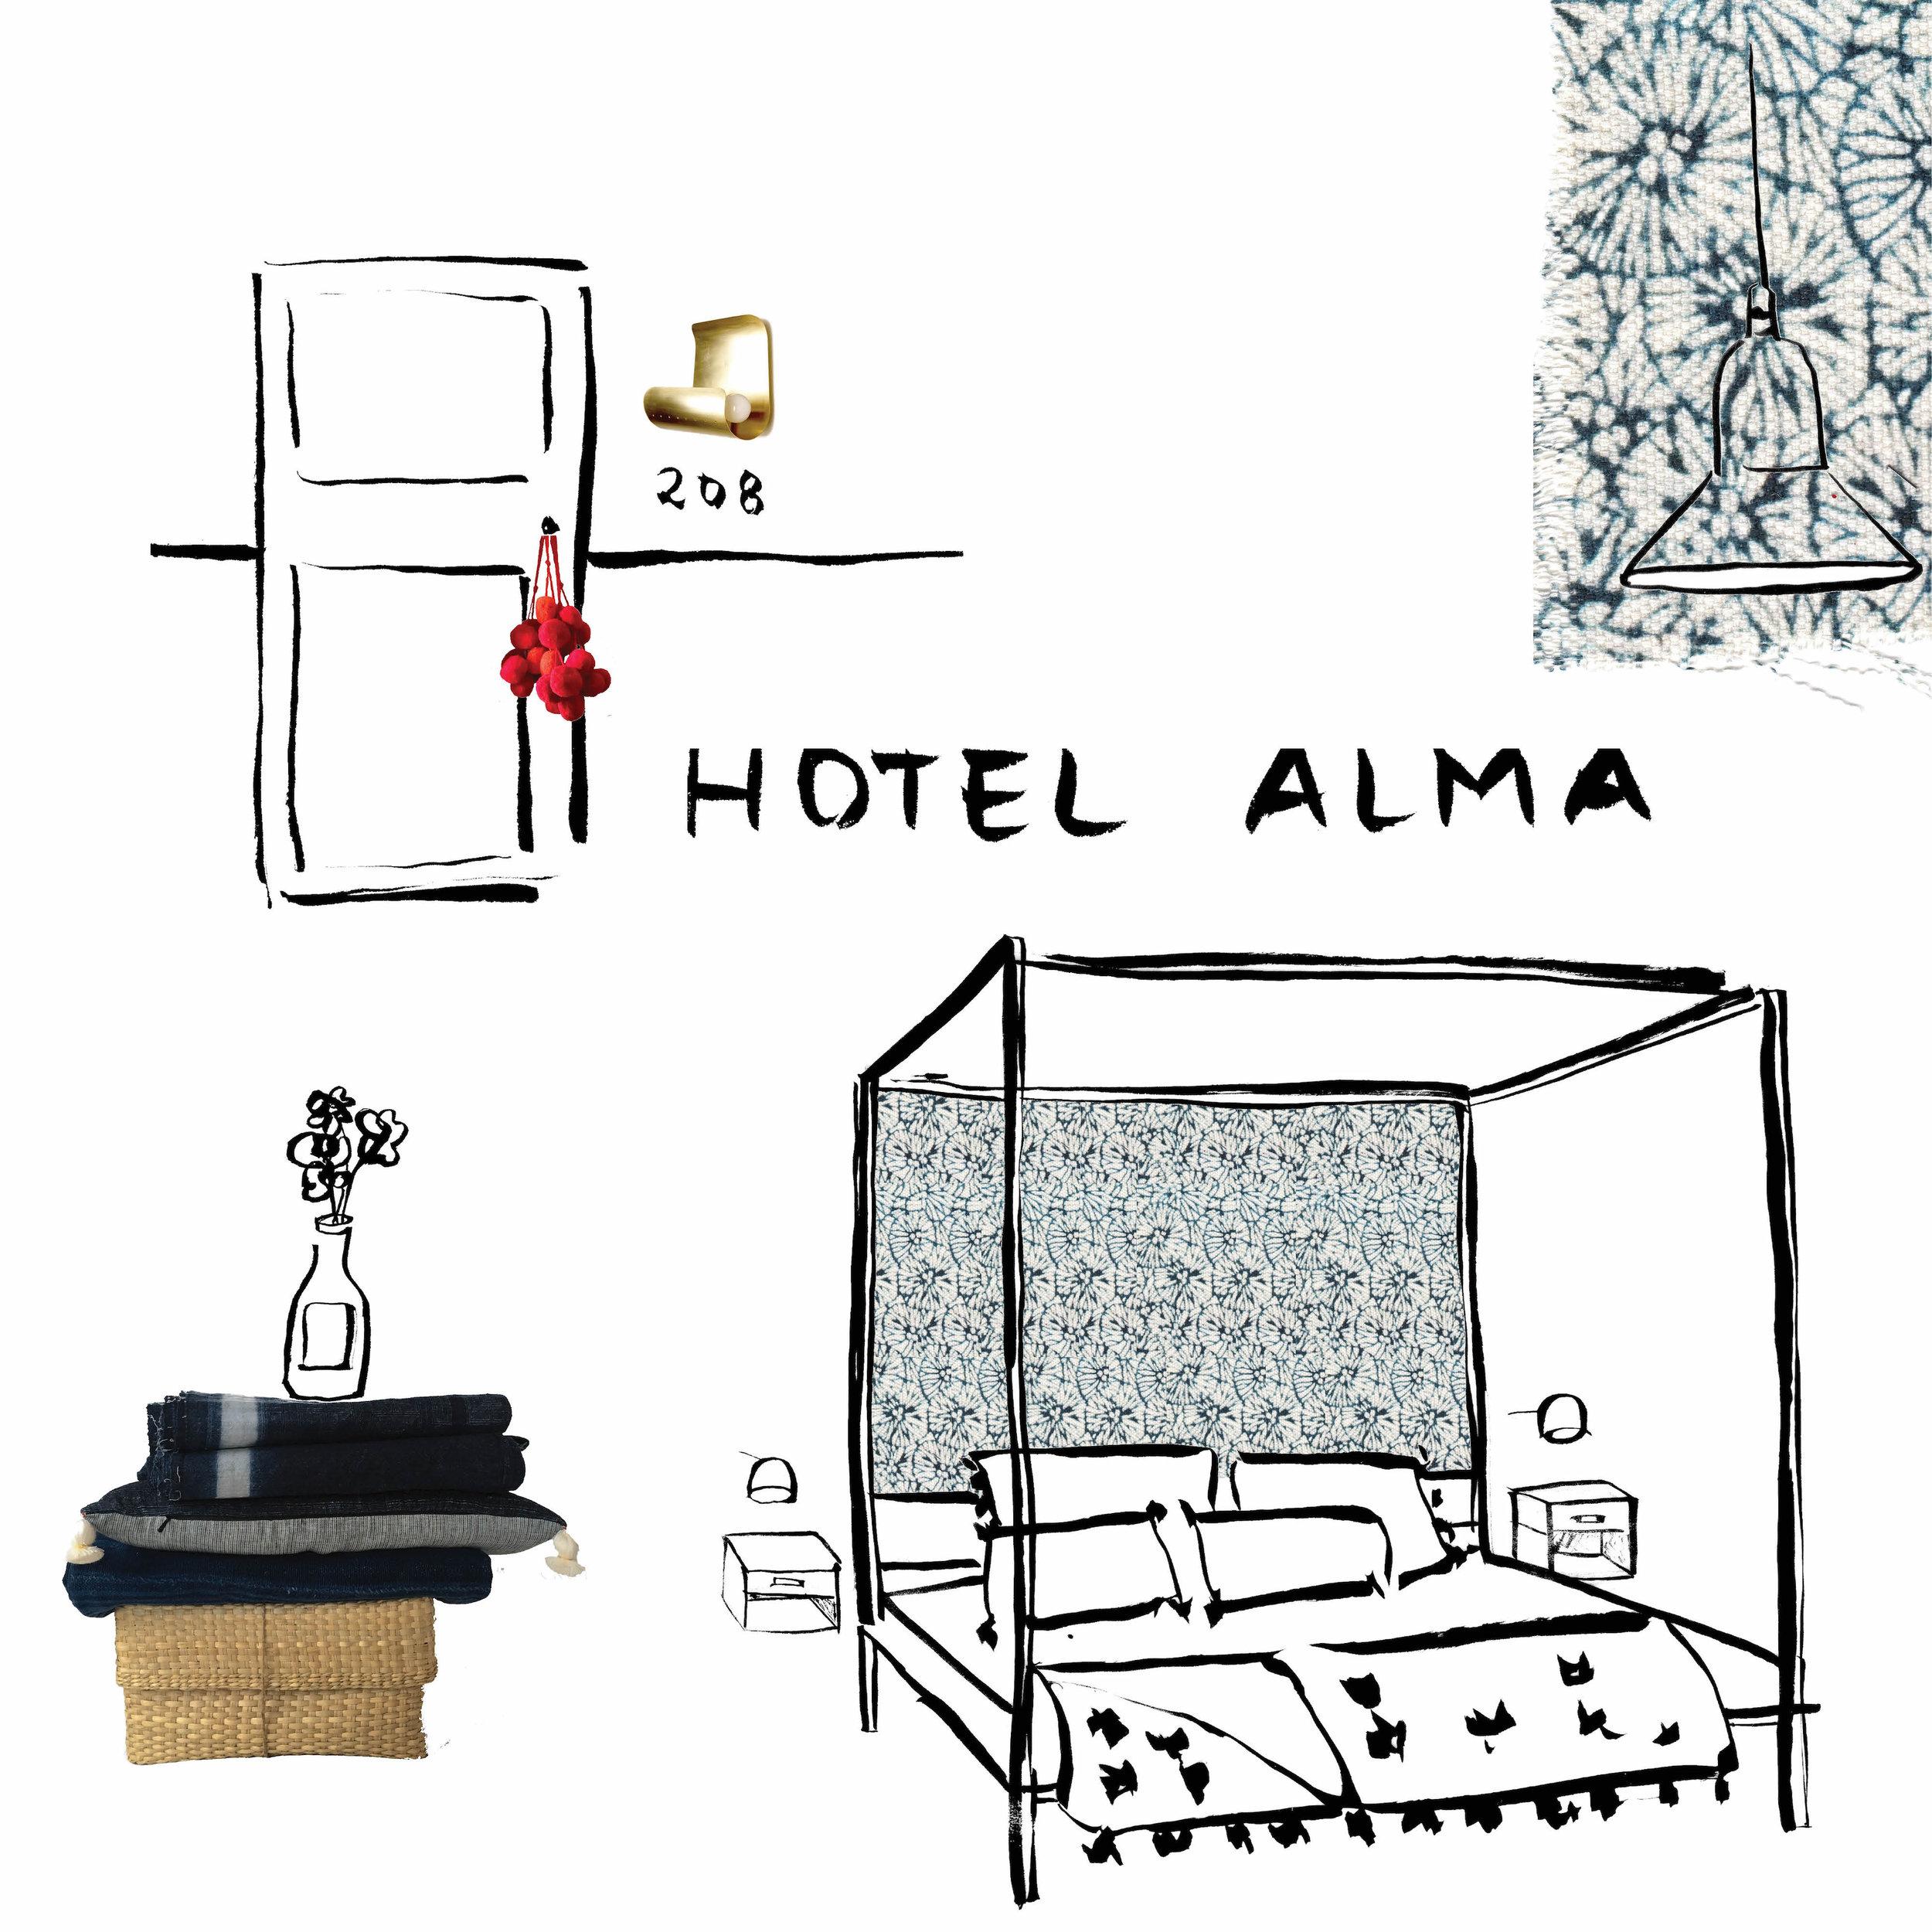 alma cafe restaurant hotel minneapolis design by talin spring